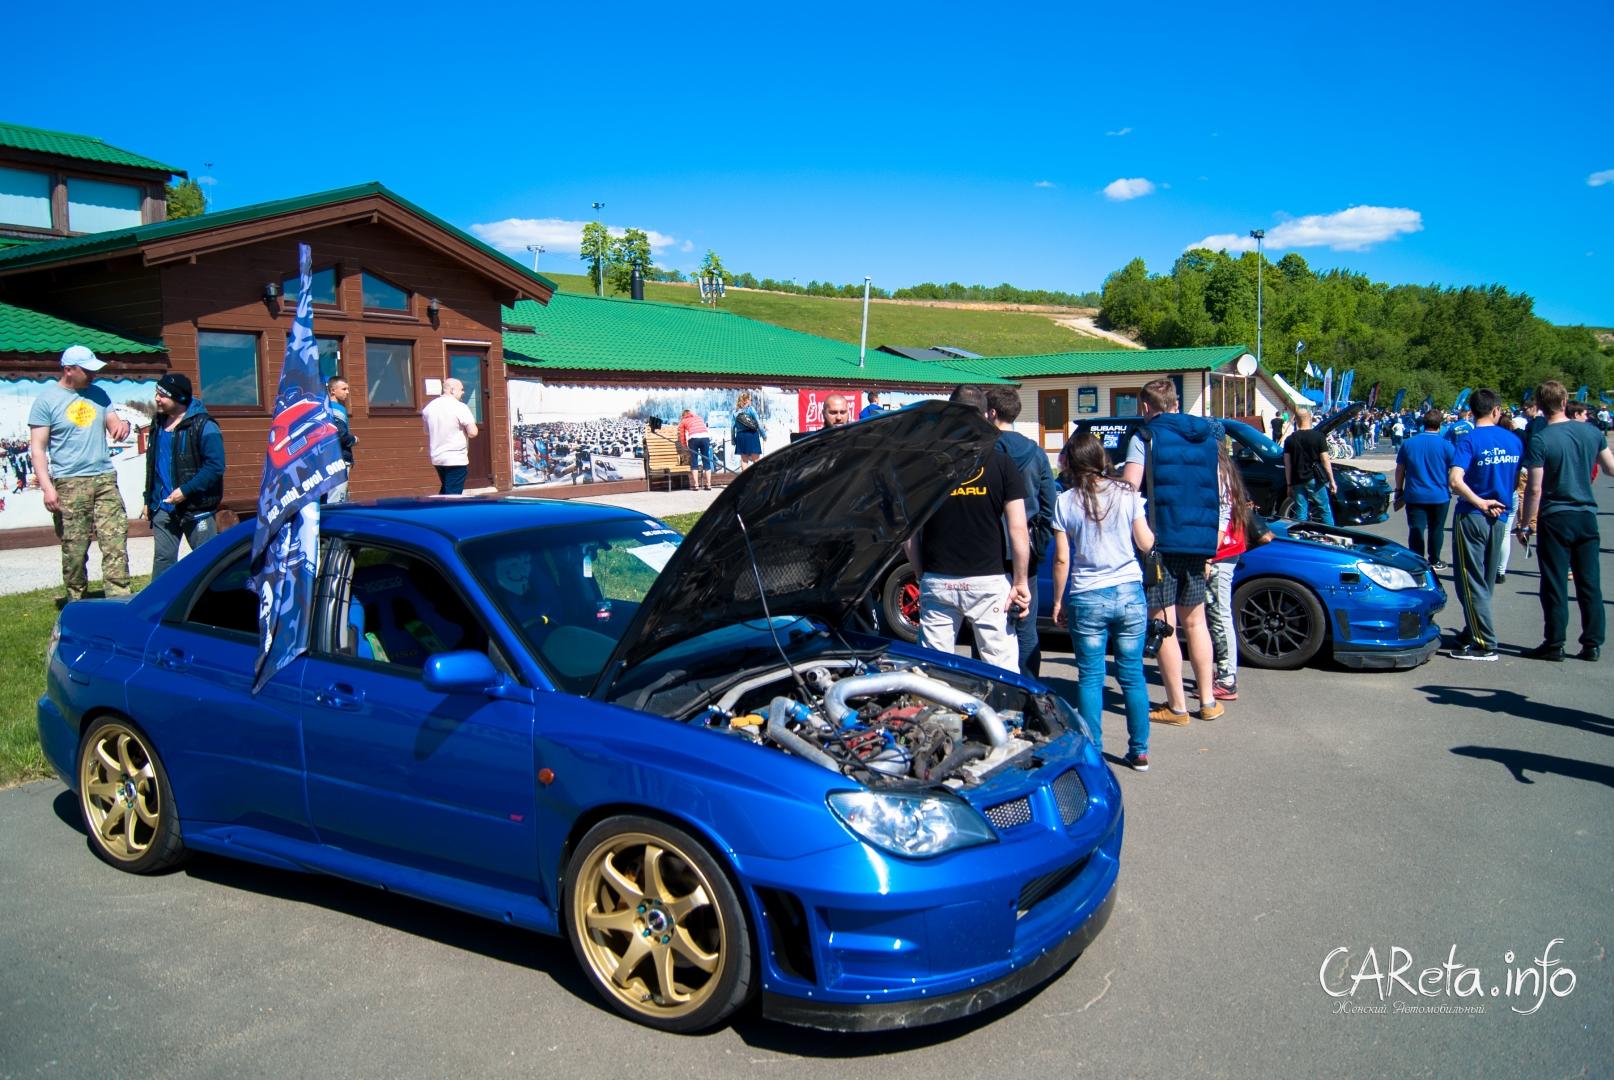 SubaFest 2015: дорогу японцам!